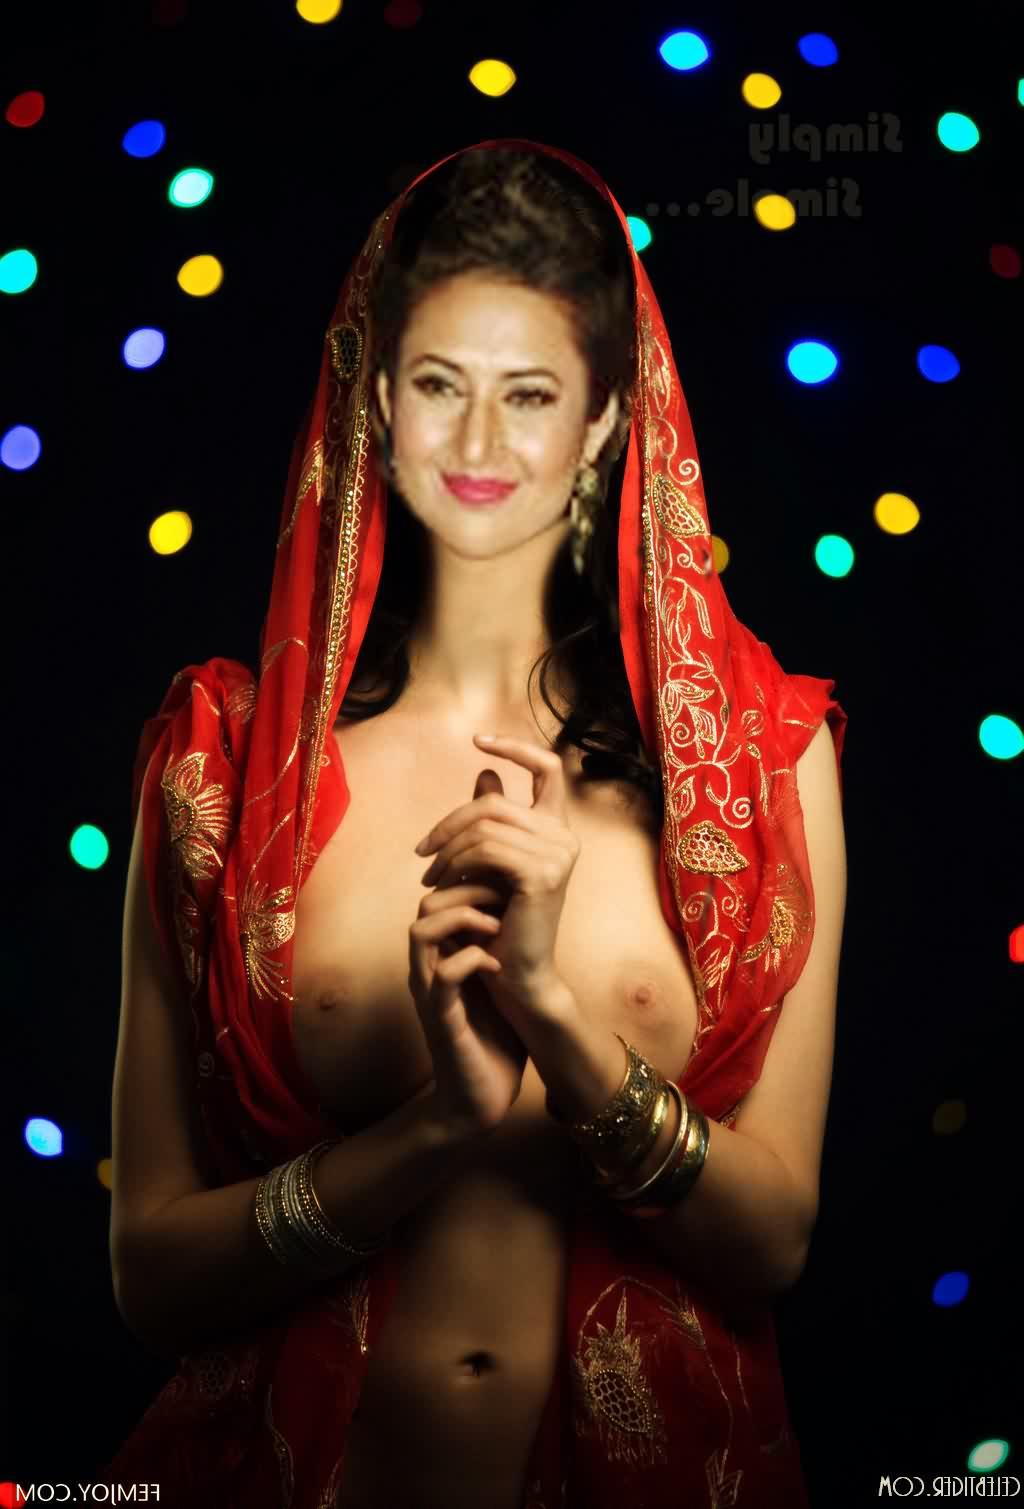 Divyanka Tripathi naked xxx 4 - TV Actress Divyanka Tripathi Nude Porn Sex